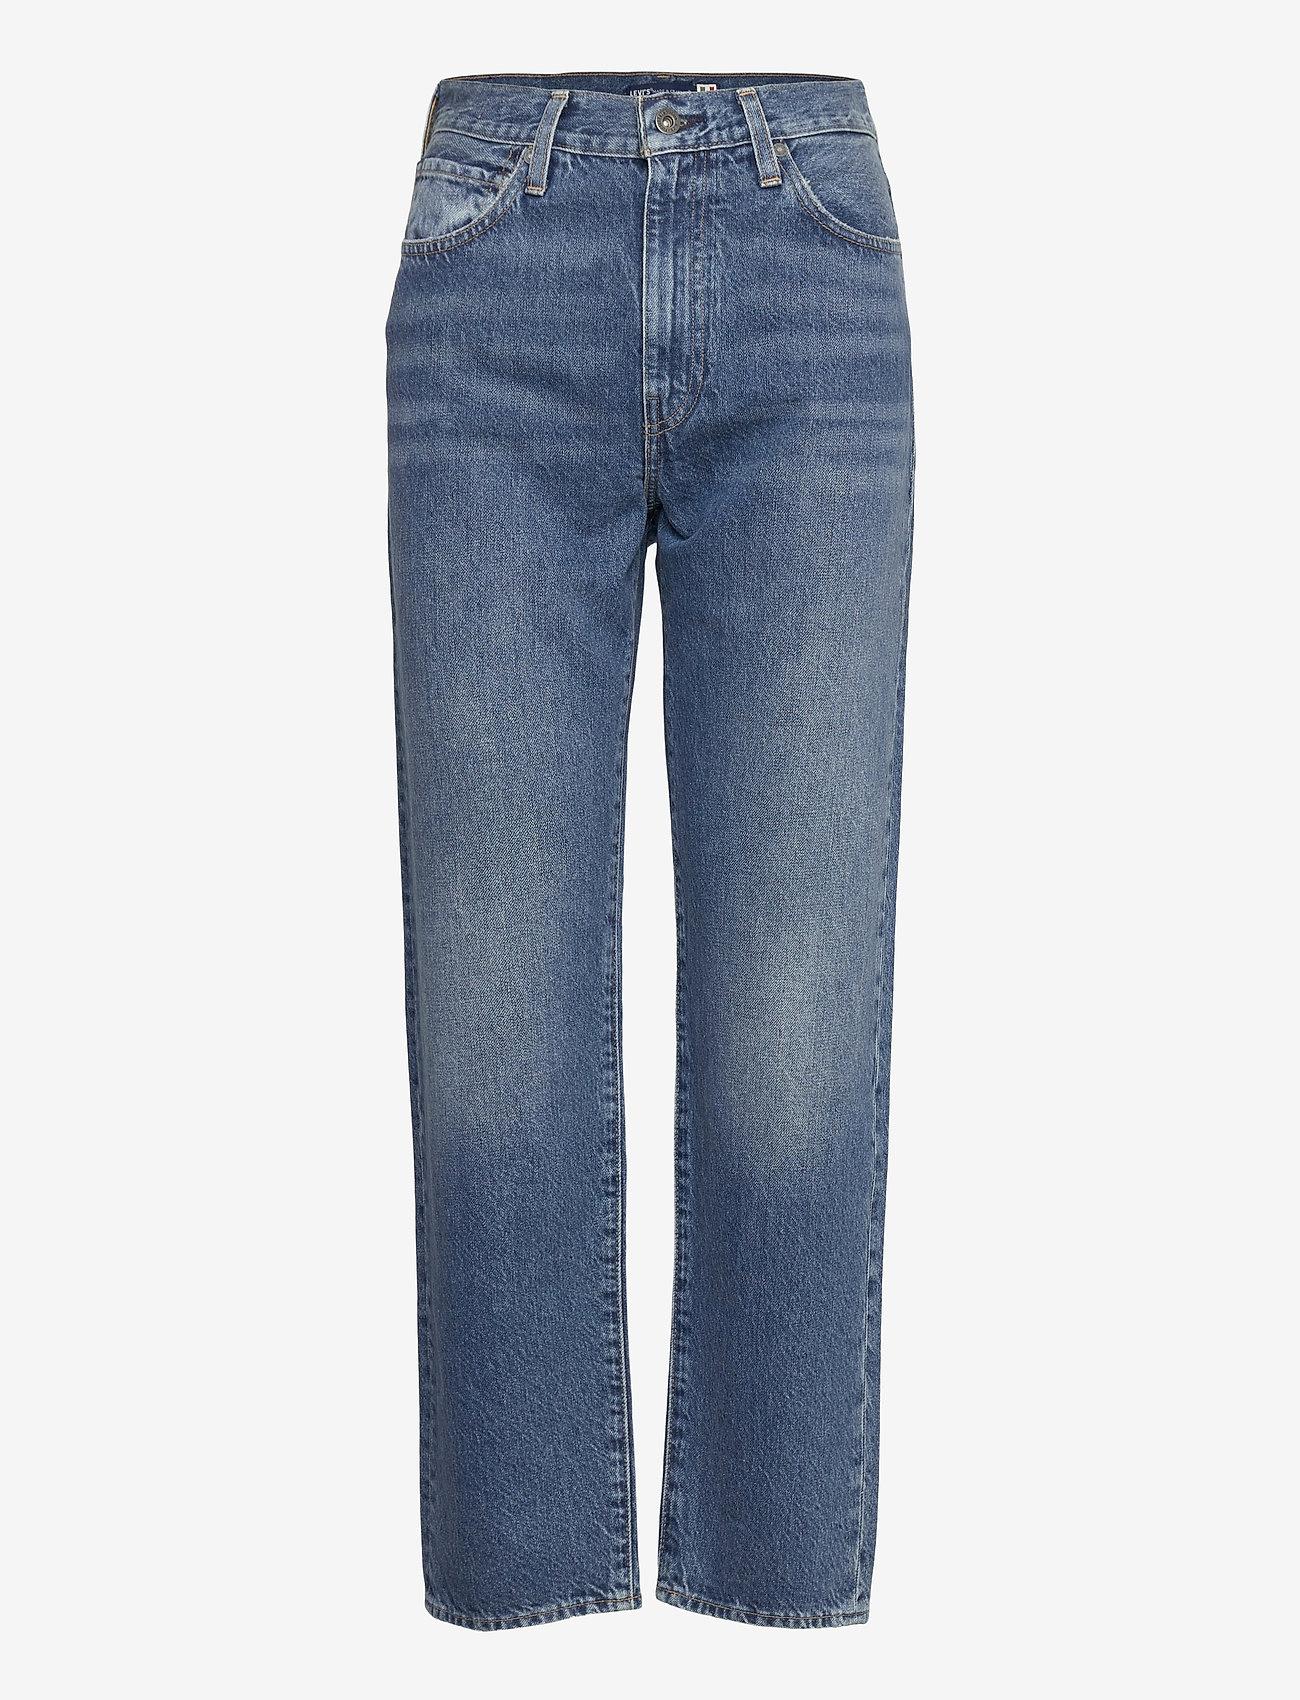 Levi's Made & Crafted - LMC THE COLUMN LMC SAPPHIRE - mom jeans - blacks - 0